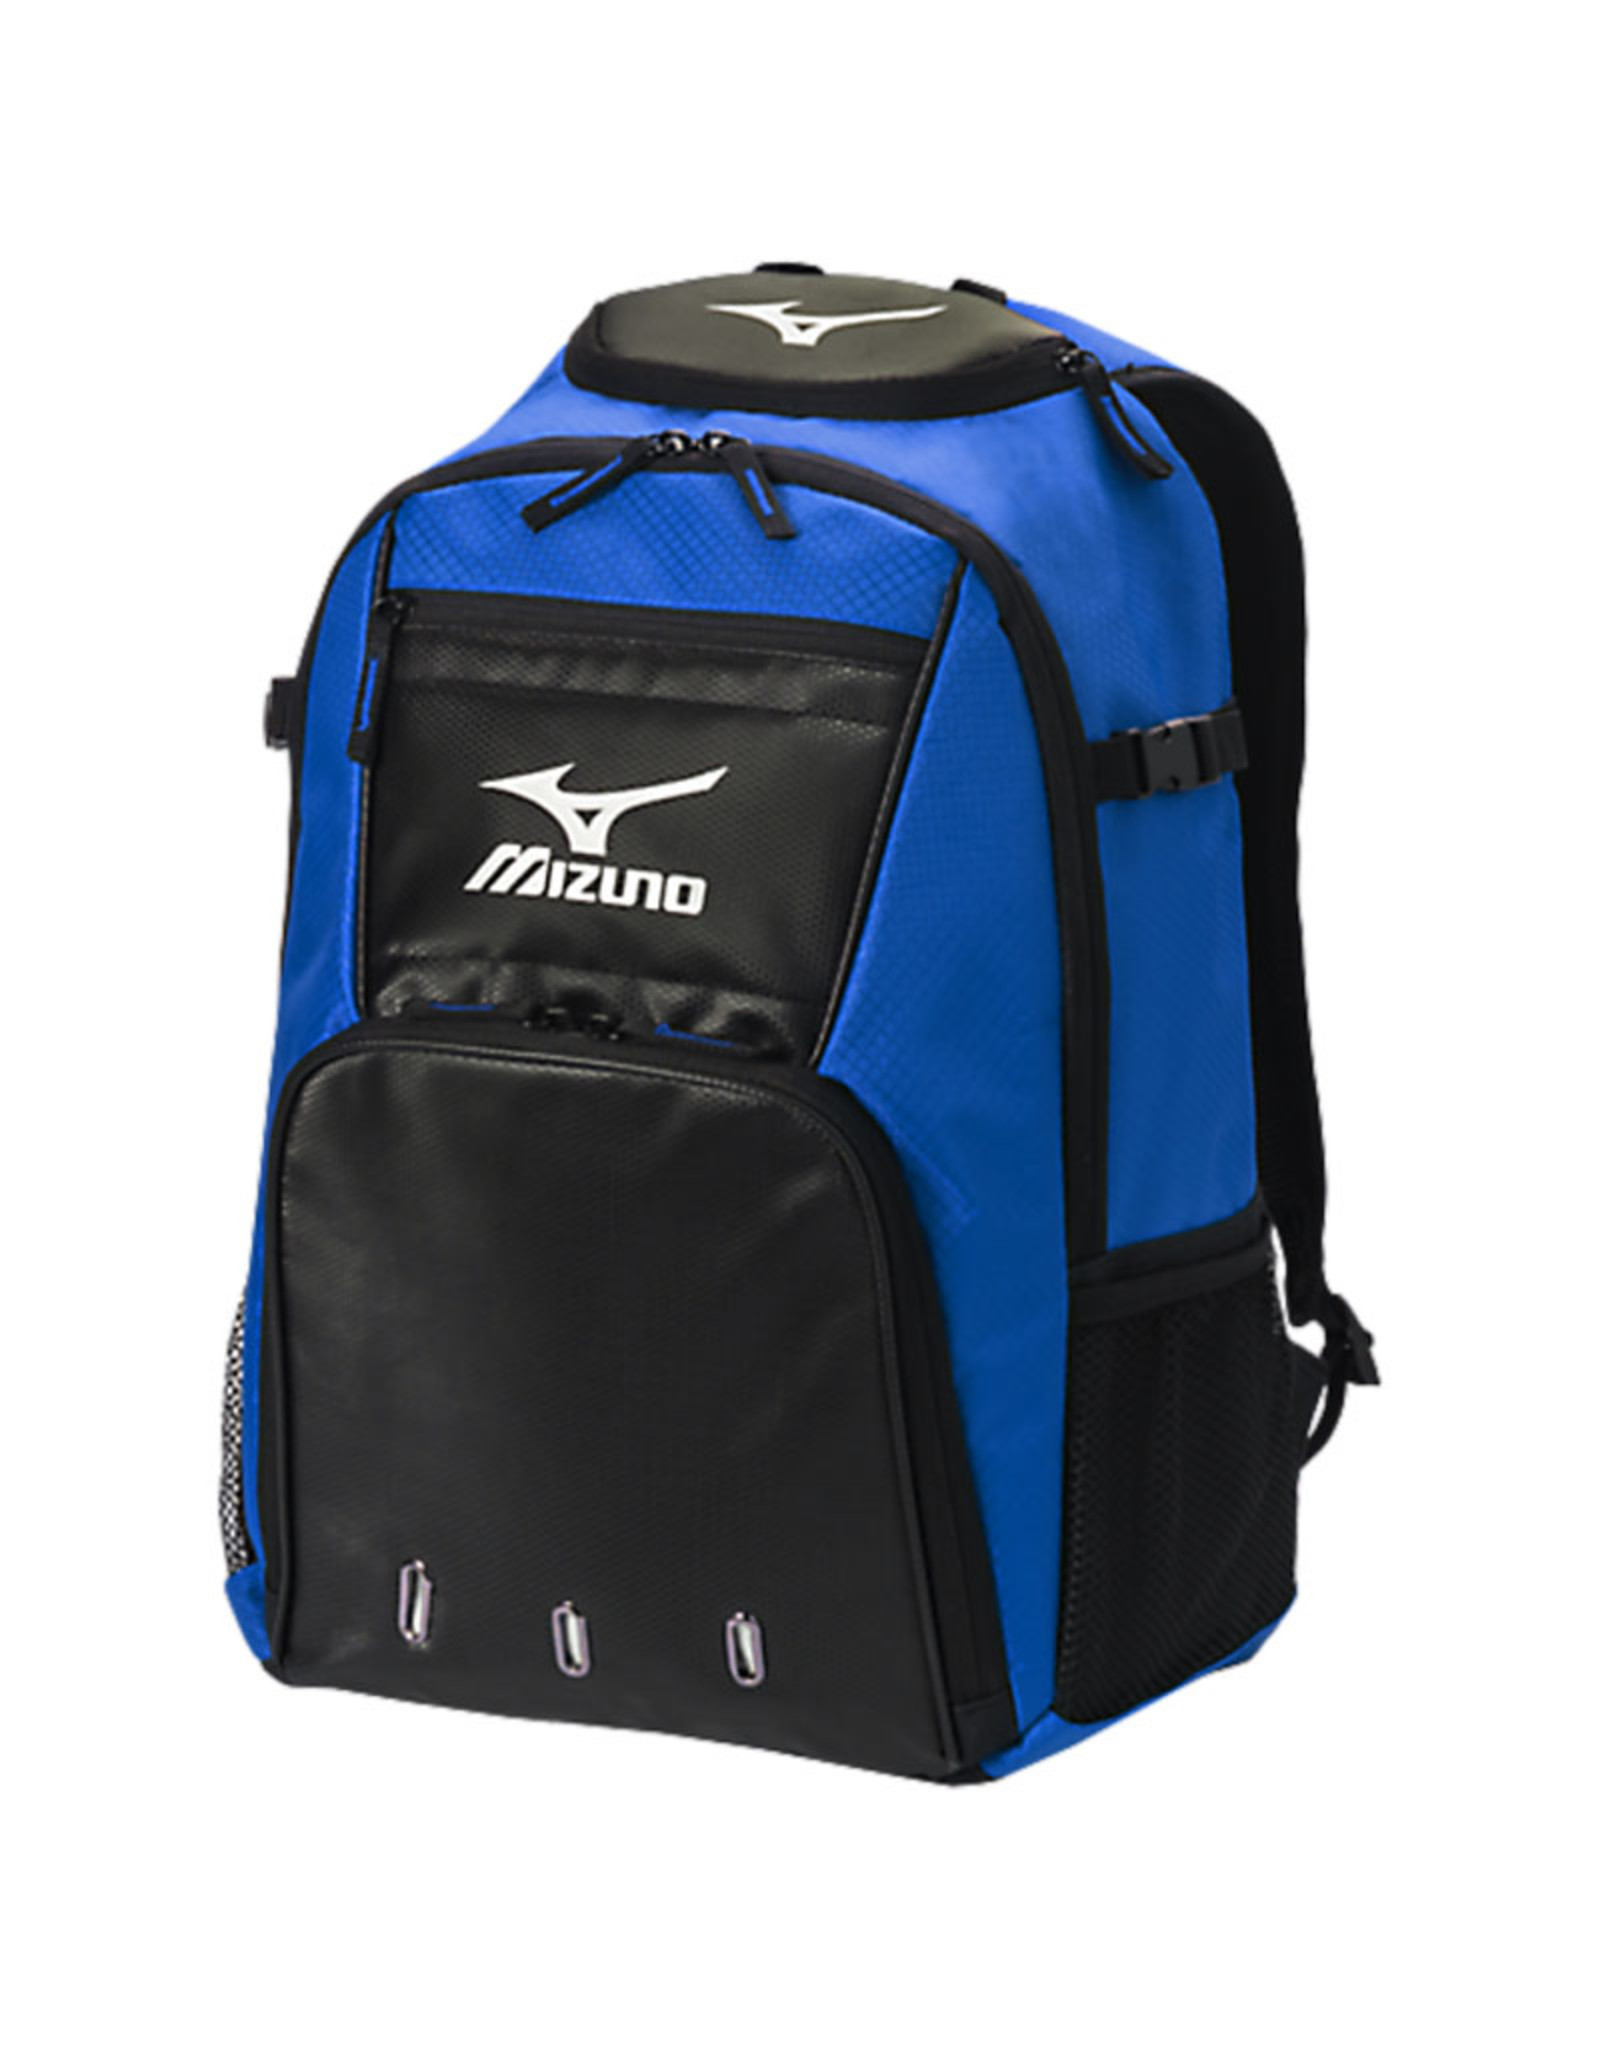 Mizuno Organizer G4 Backpack